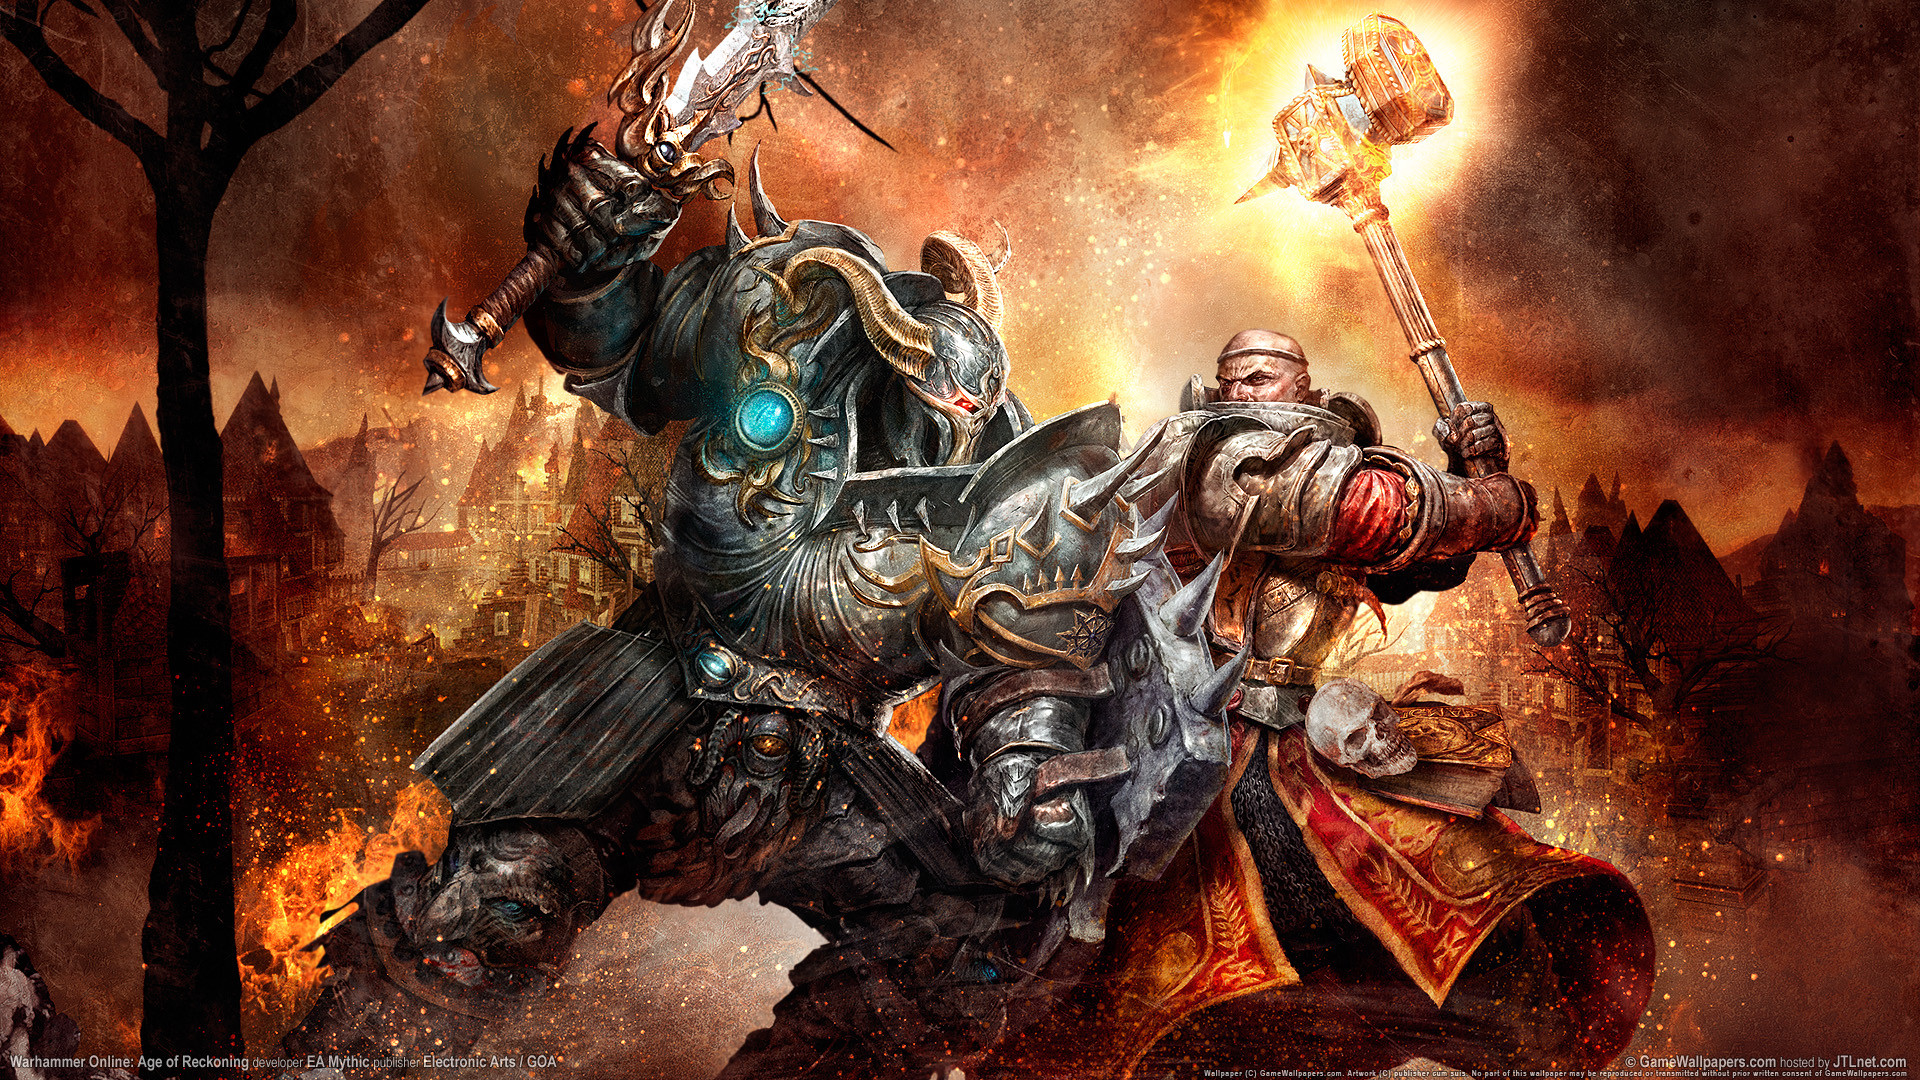 Warhammer 40k Eldar Wallpaper 69 Images